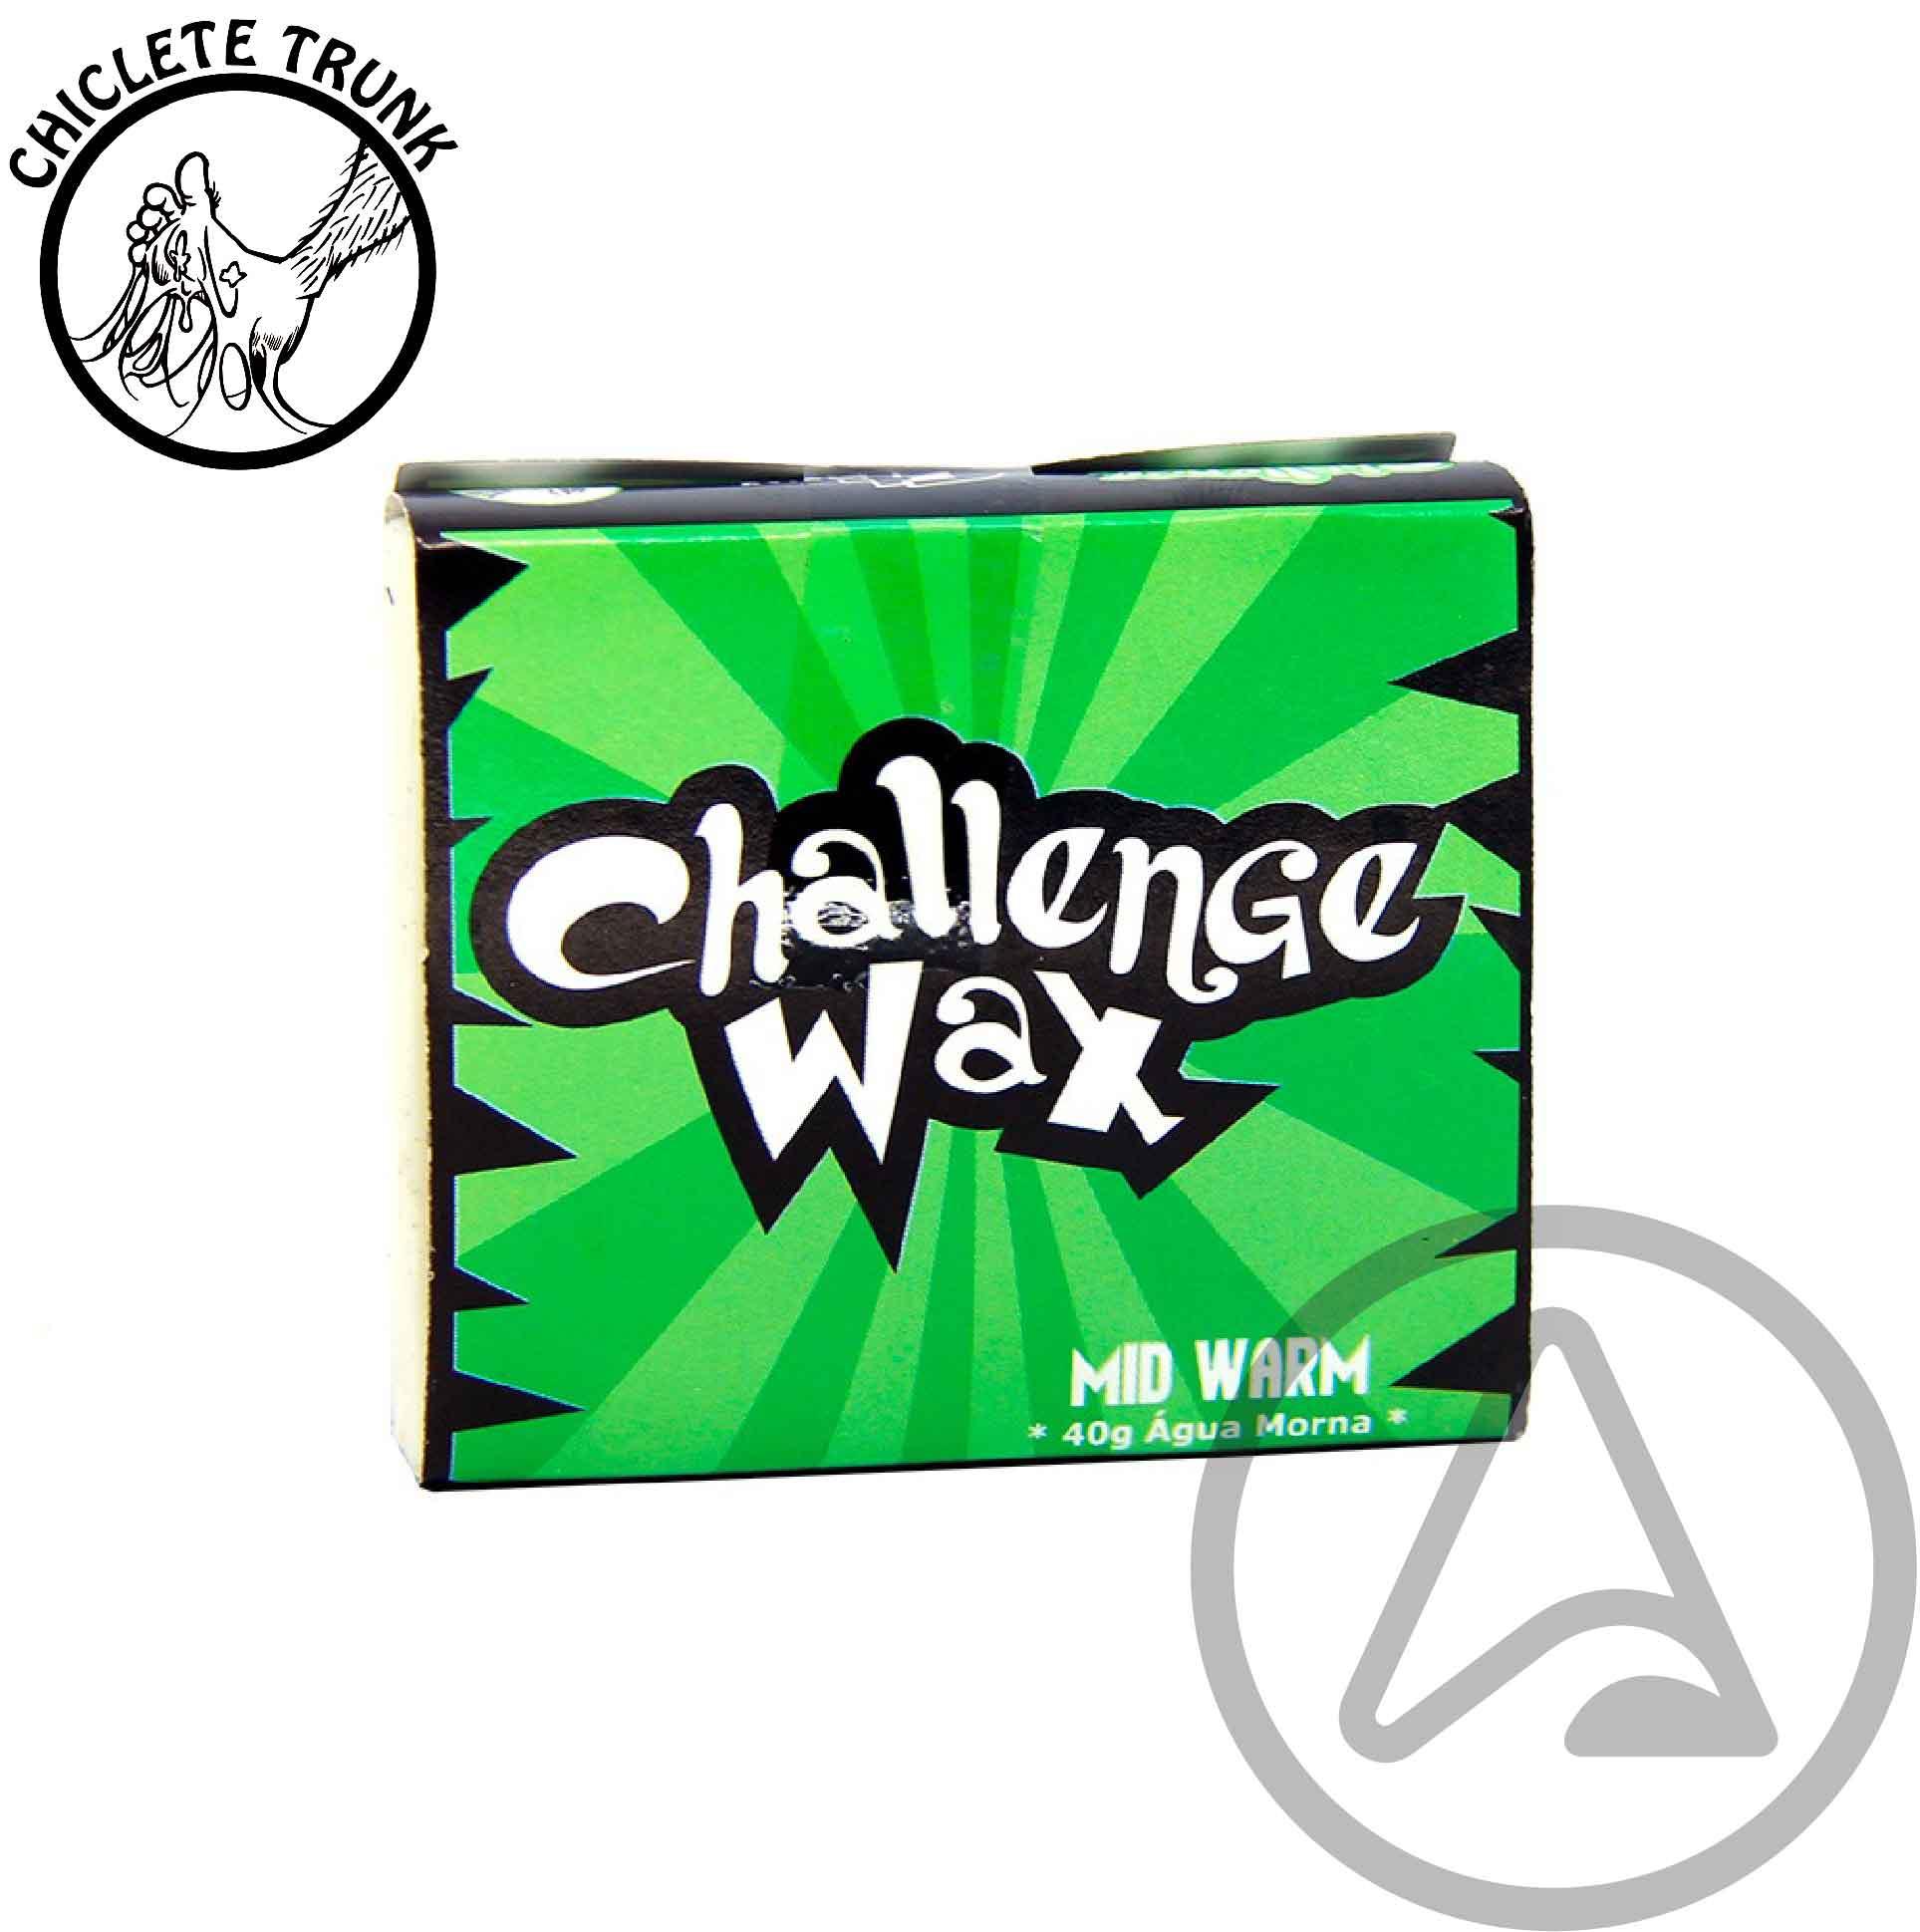 Kit Parafinas CTWax Challenge Wax  40g - 10 Unidades